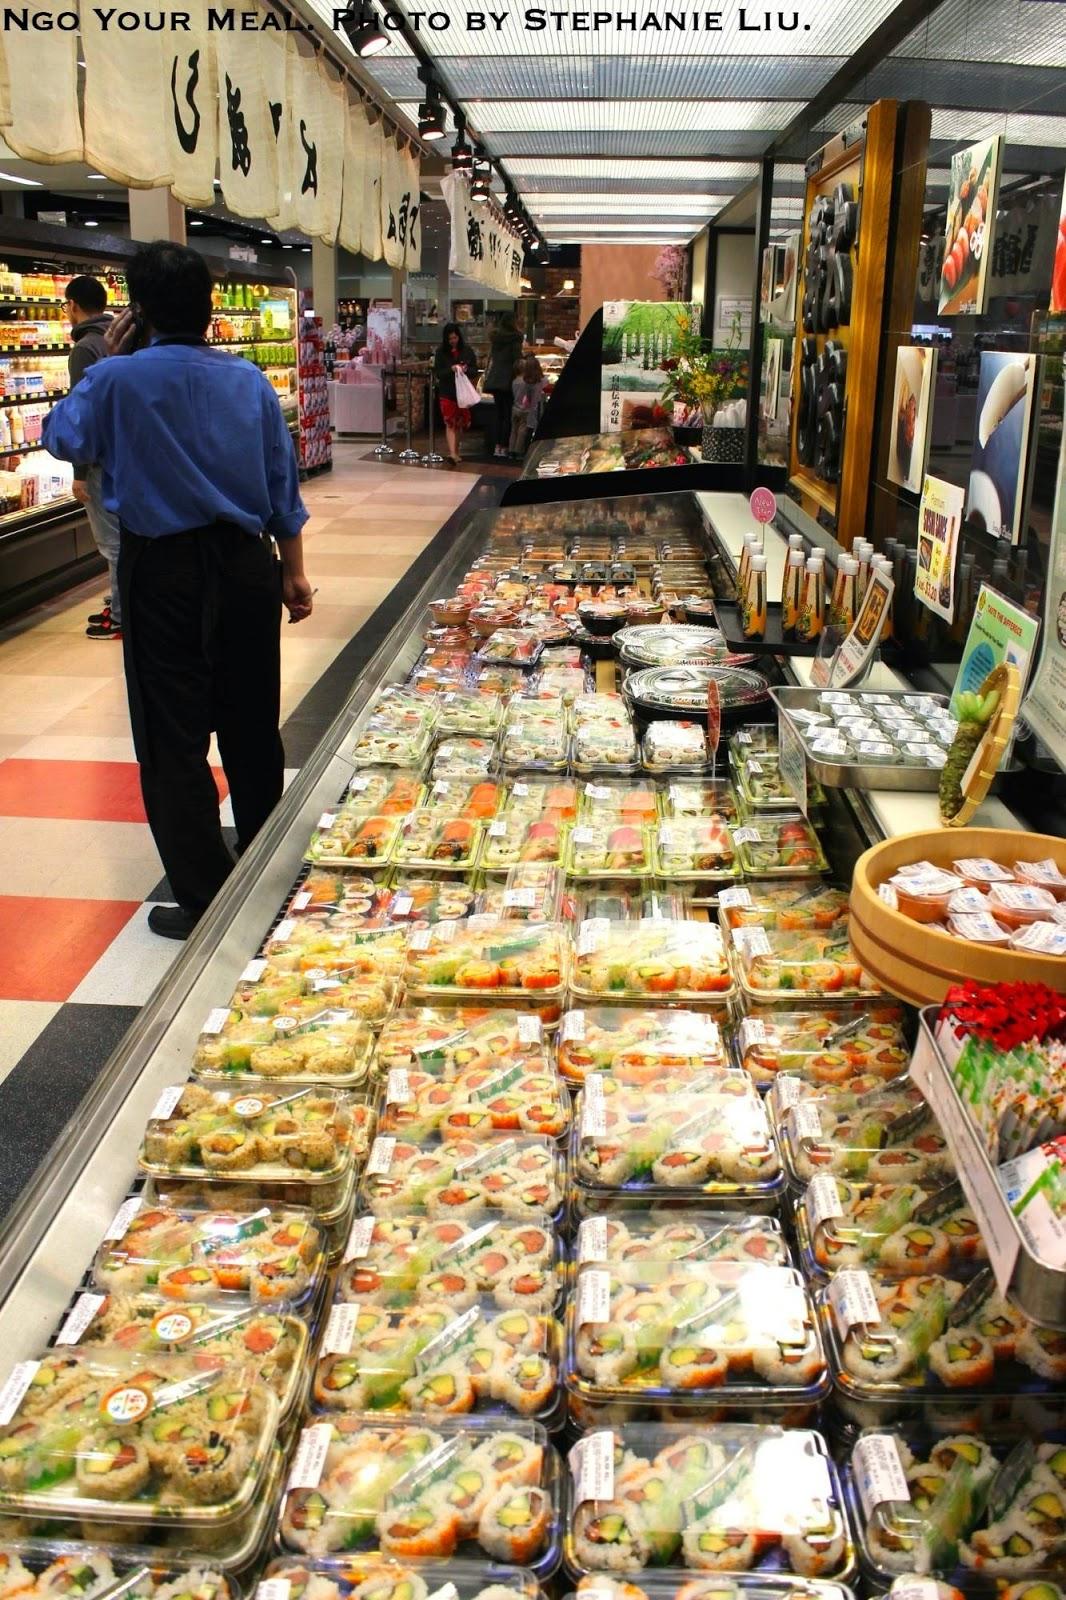 Mitsuwa Sushi Selection by Stephanie Liu